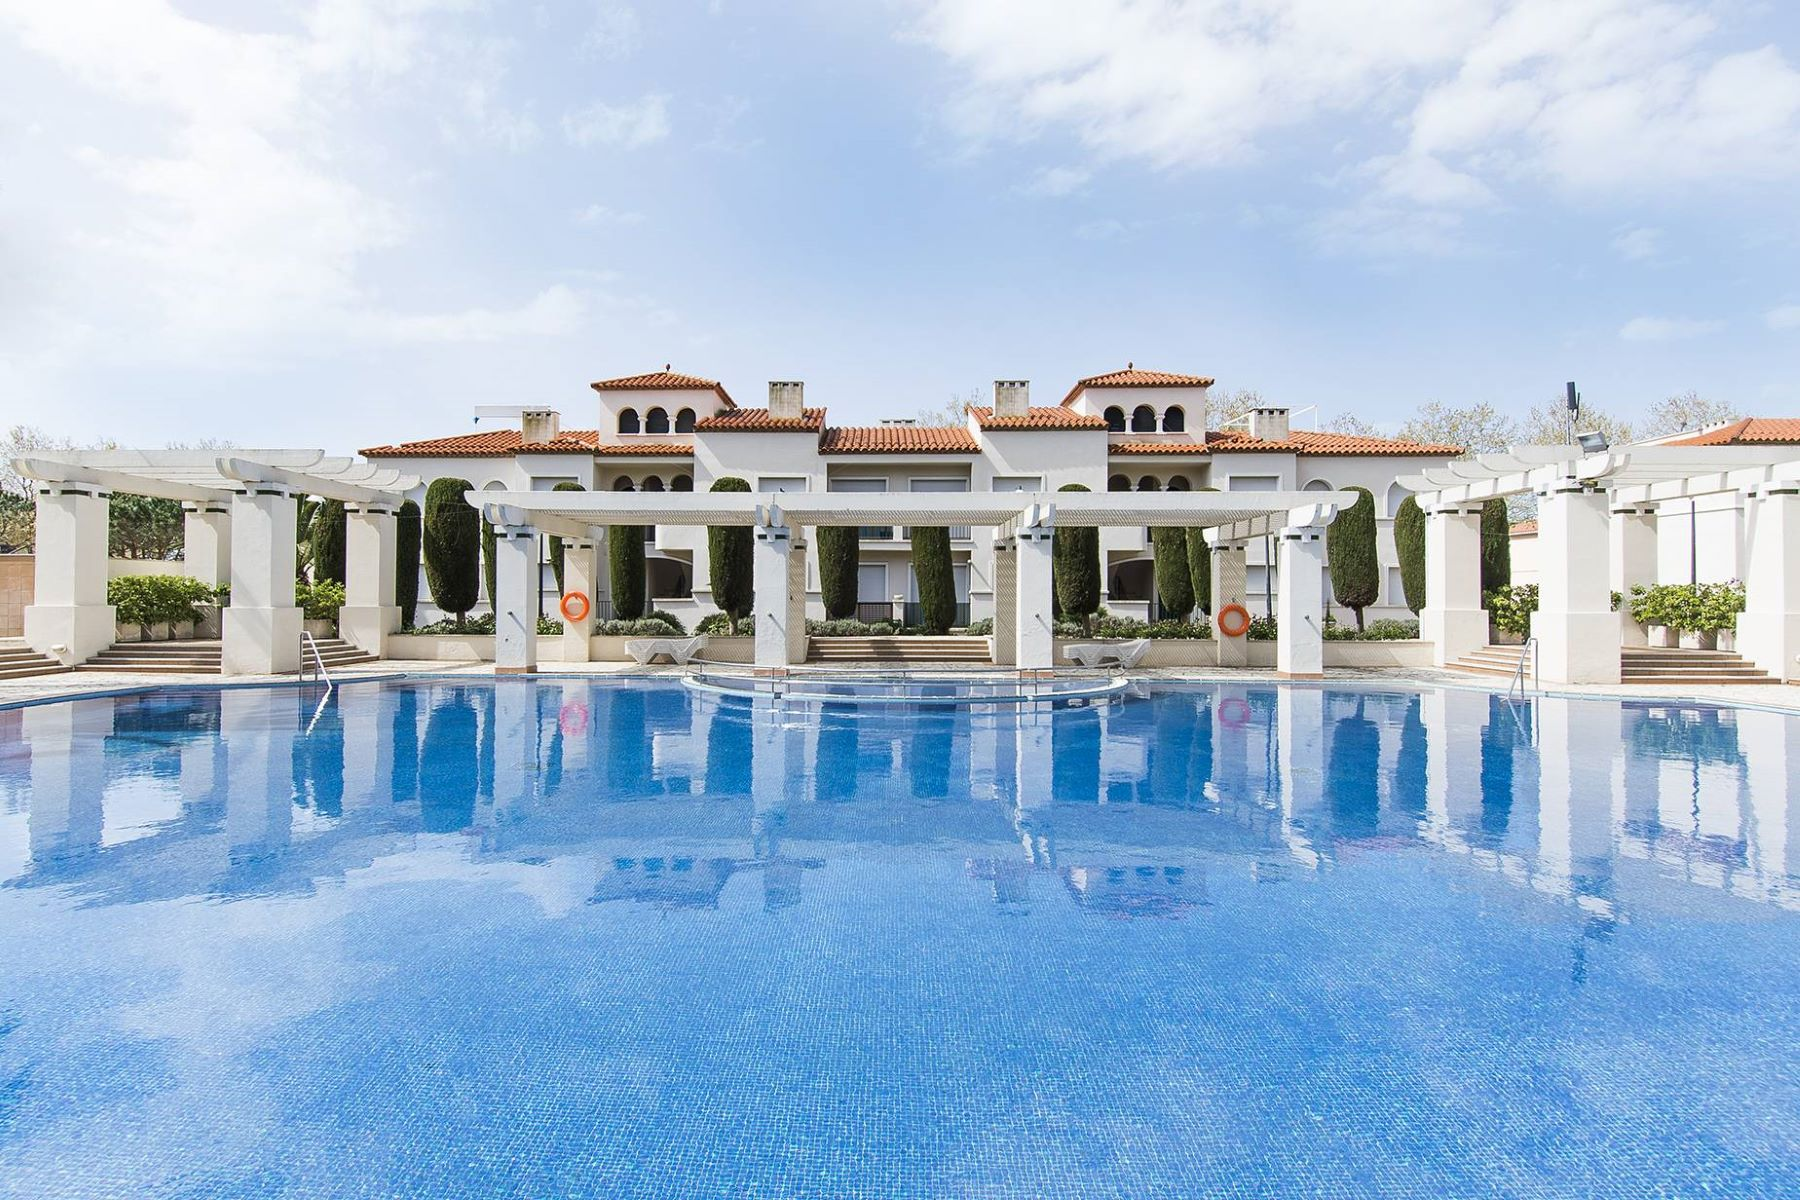 Apartamento para Venda às S'Agaró penthouse 100 metres from the beach S'Agaro, Costa Brava, 17248 Espanha